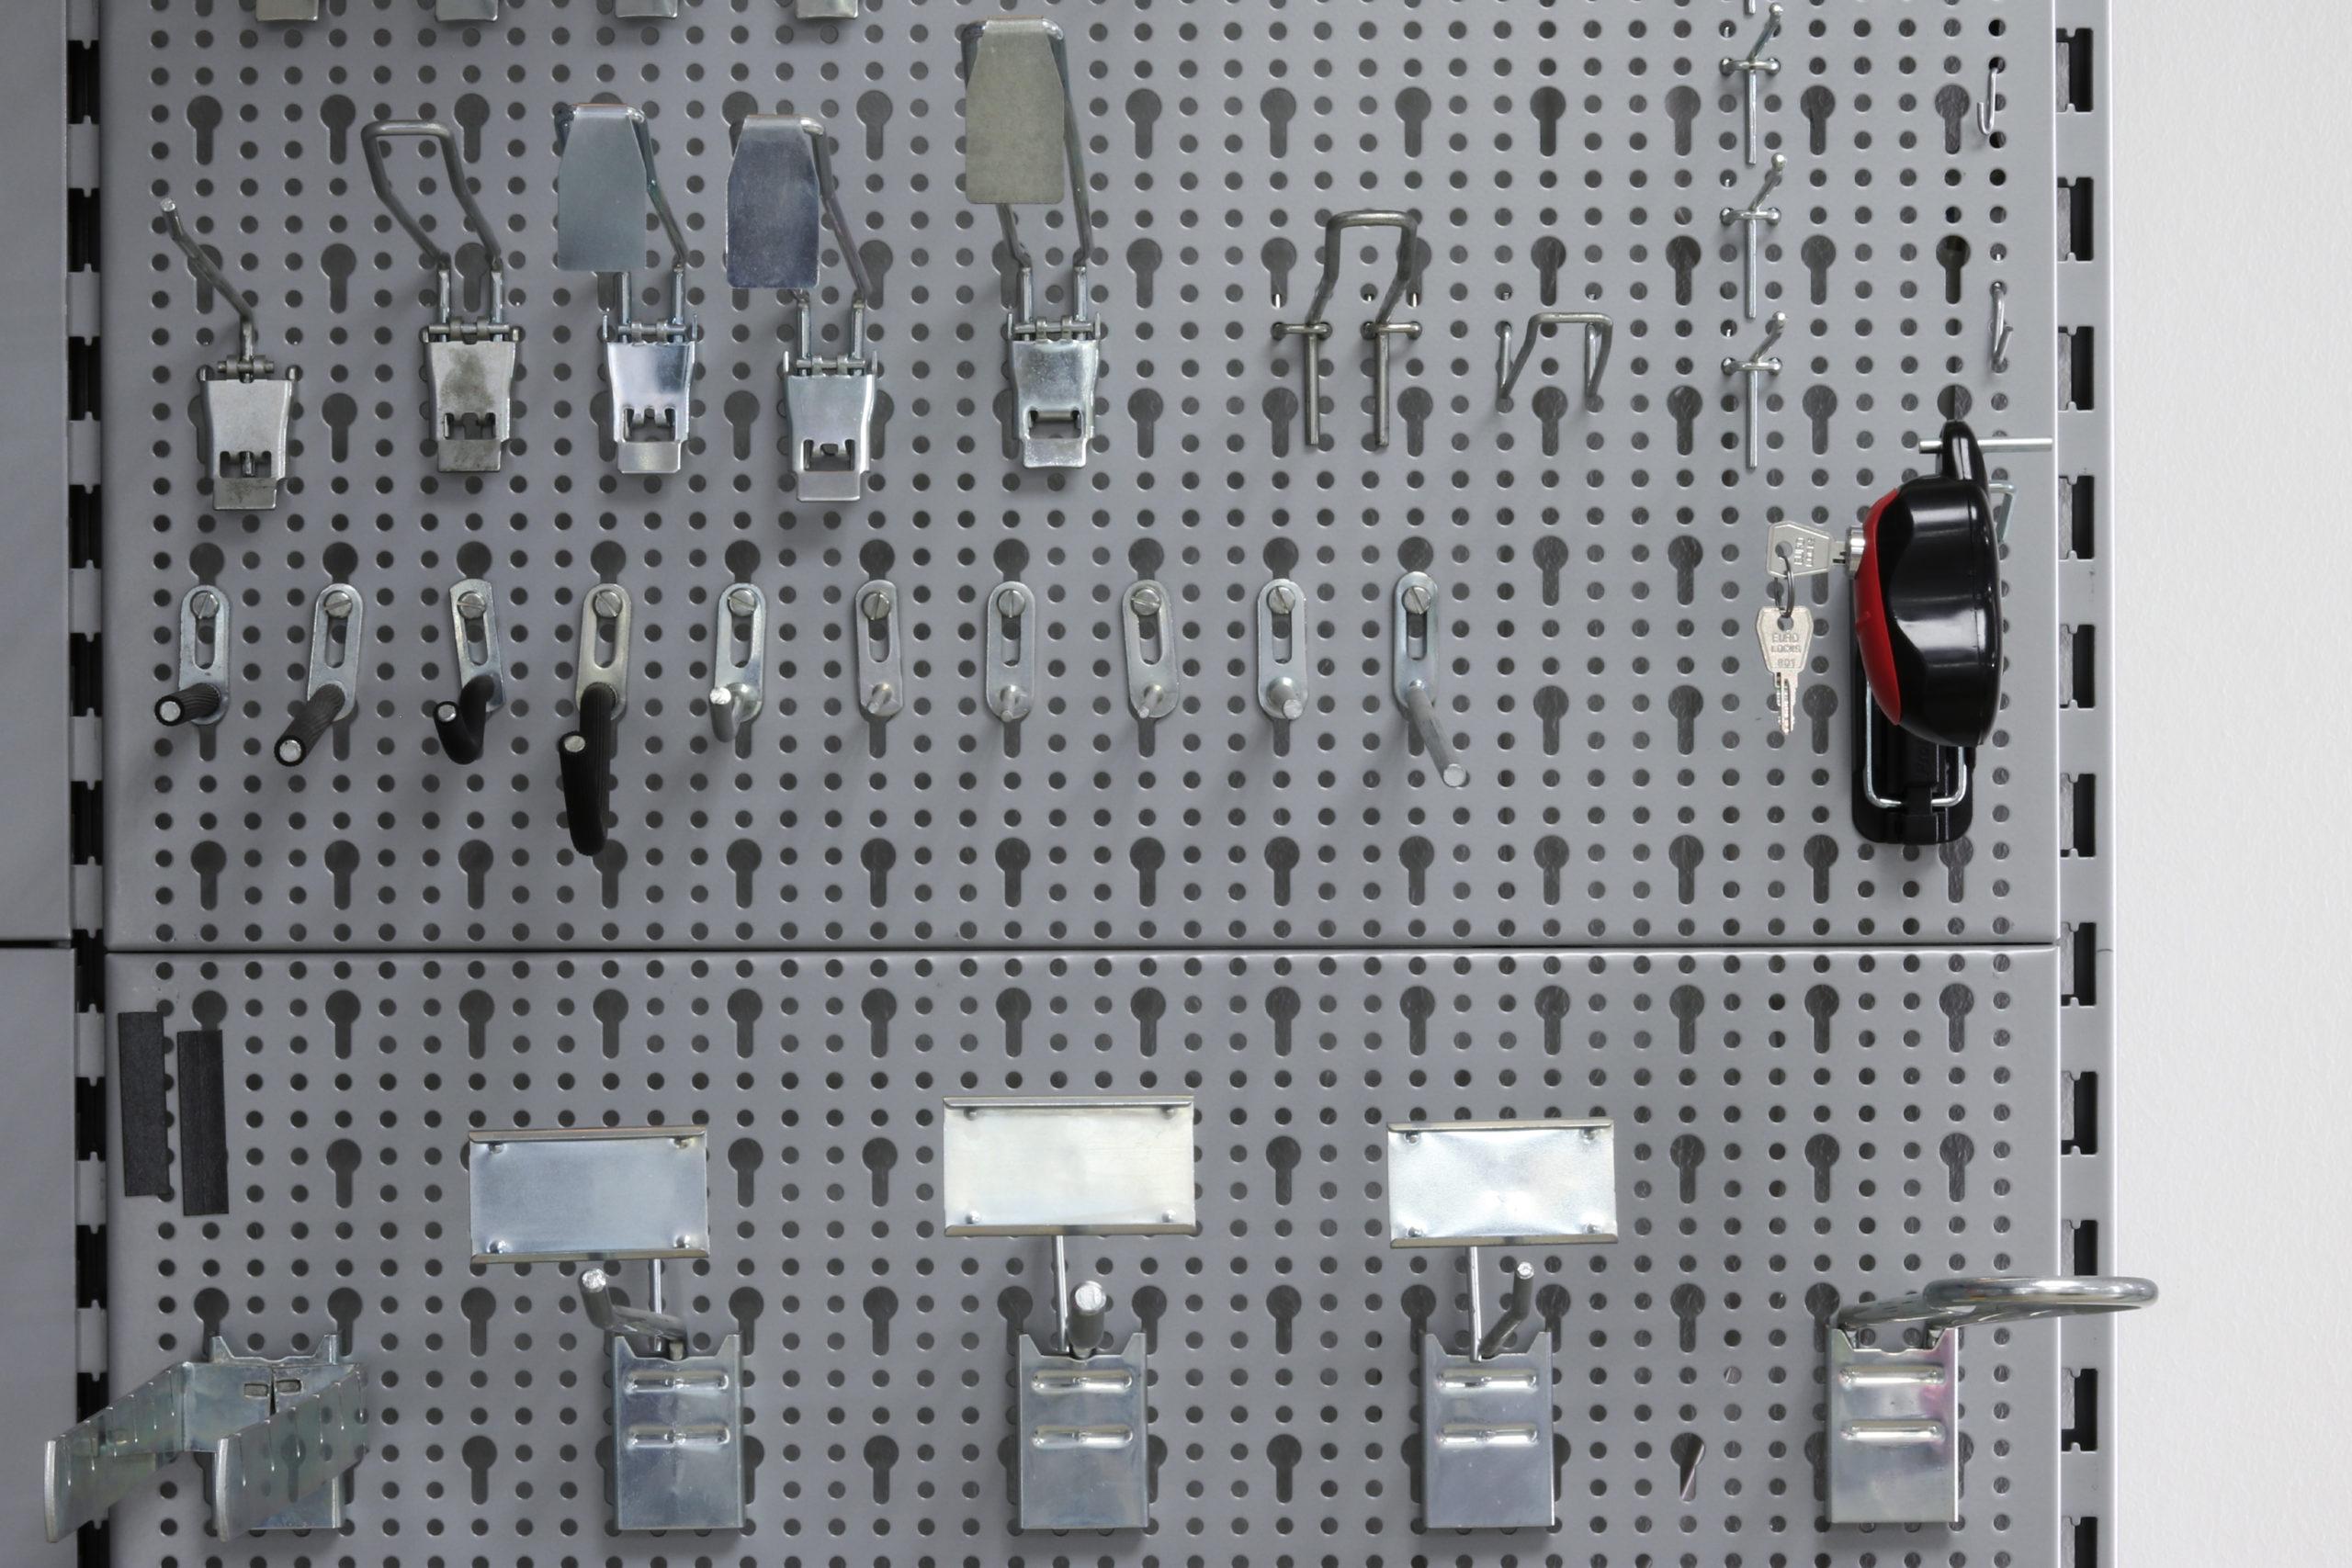 Kompetenzen-5-Logistik-Montage19